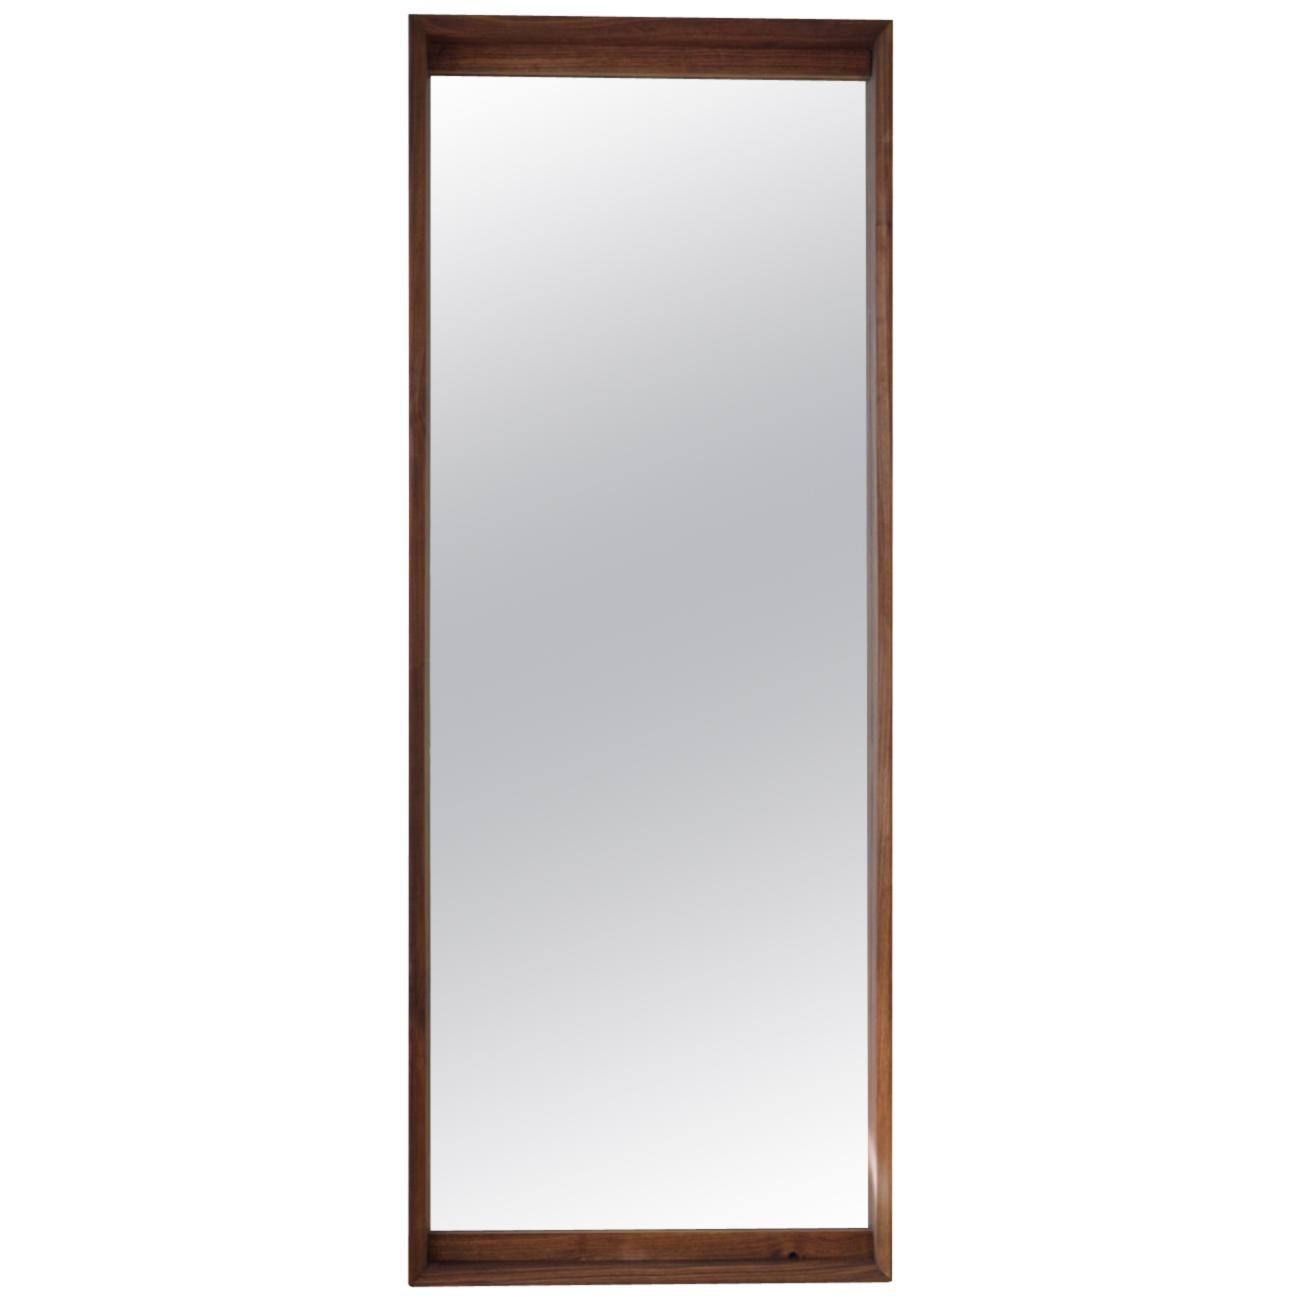 Handmade Large Format Floor Standing Walnut Mirror